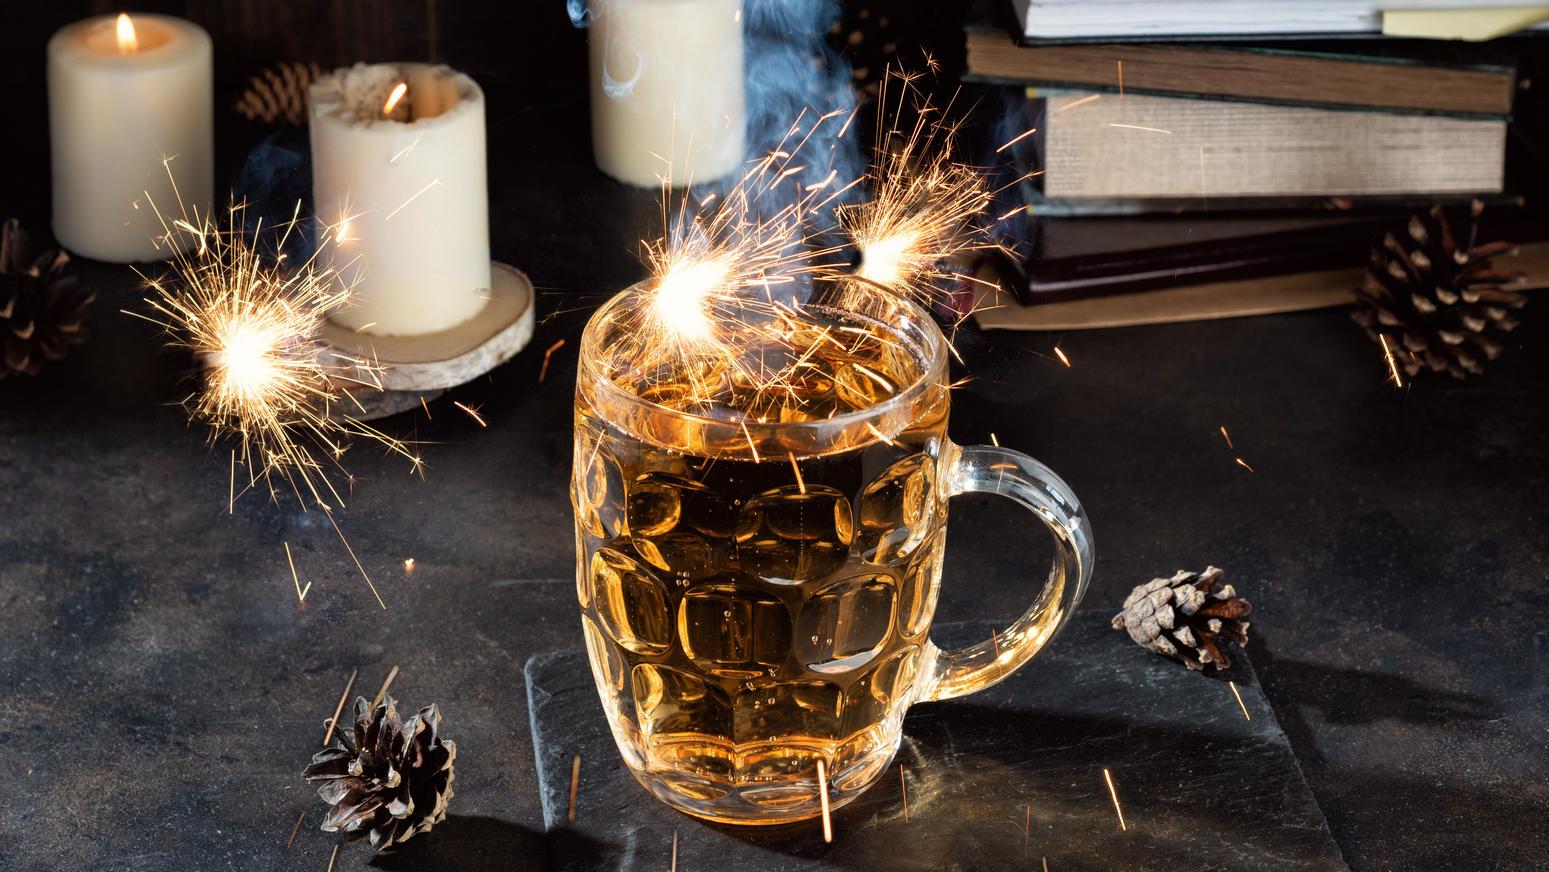 New Yorker Harry-Potter-Store: In dieser Bar gibt's bald Butterbier vom Fass - wir verraten das Rezept